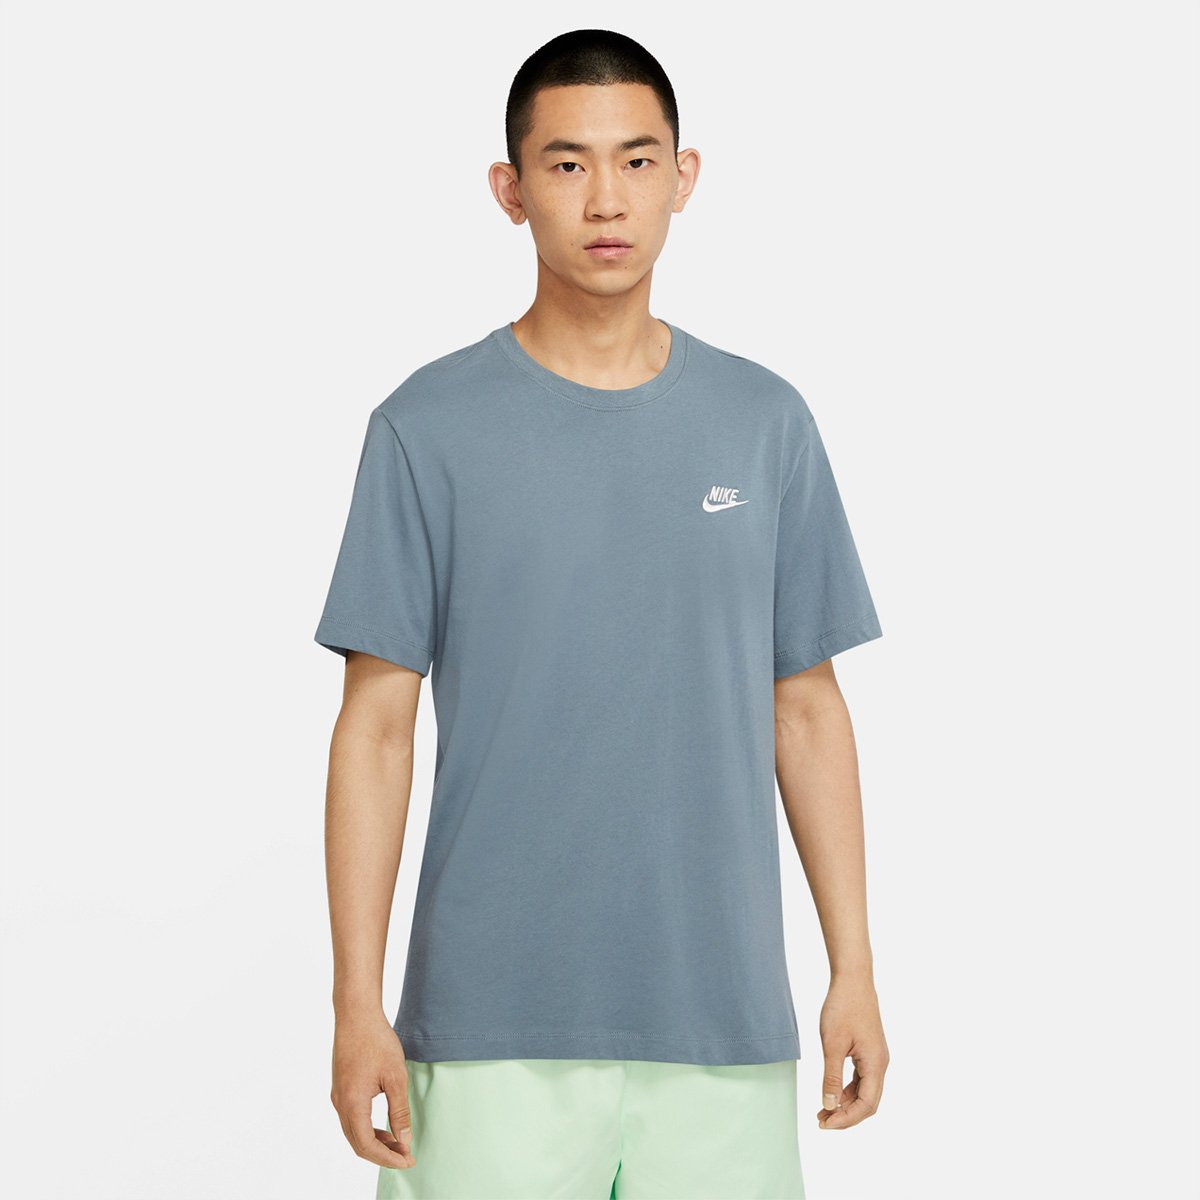 curva Flojamente Estar confundido  Camiseta Nike Sportswear Club Masculina - Azul e Branco | Zattini